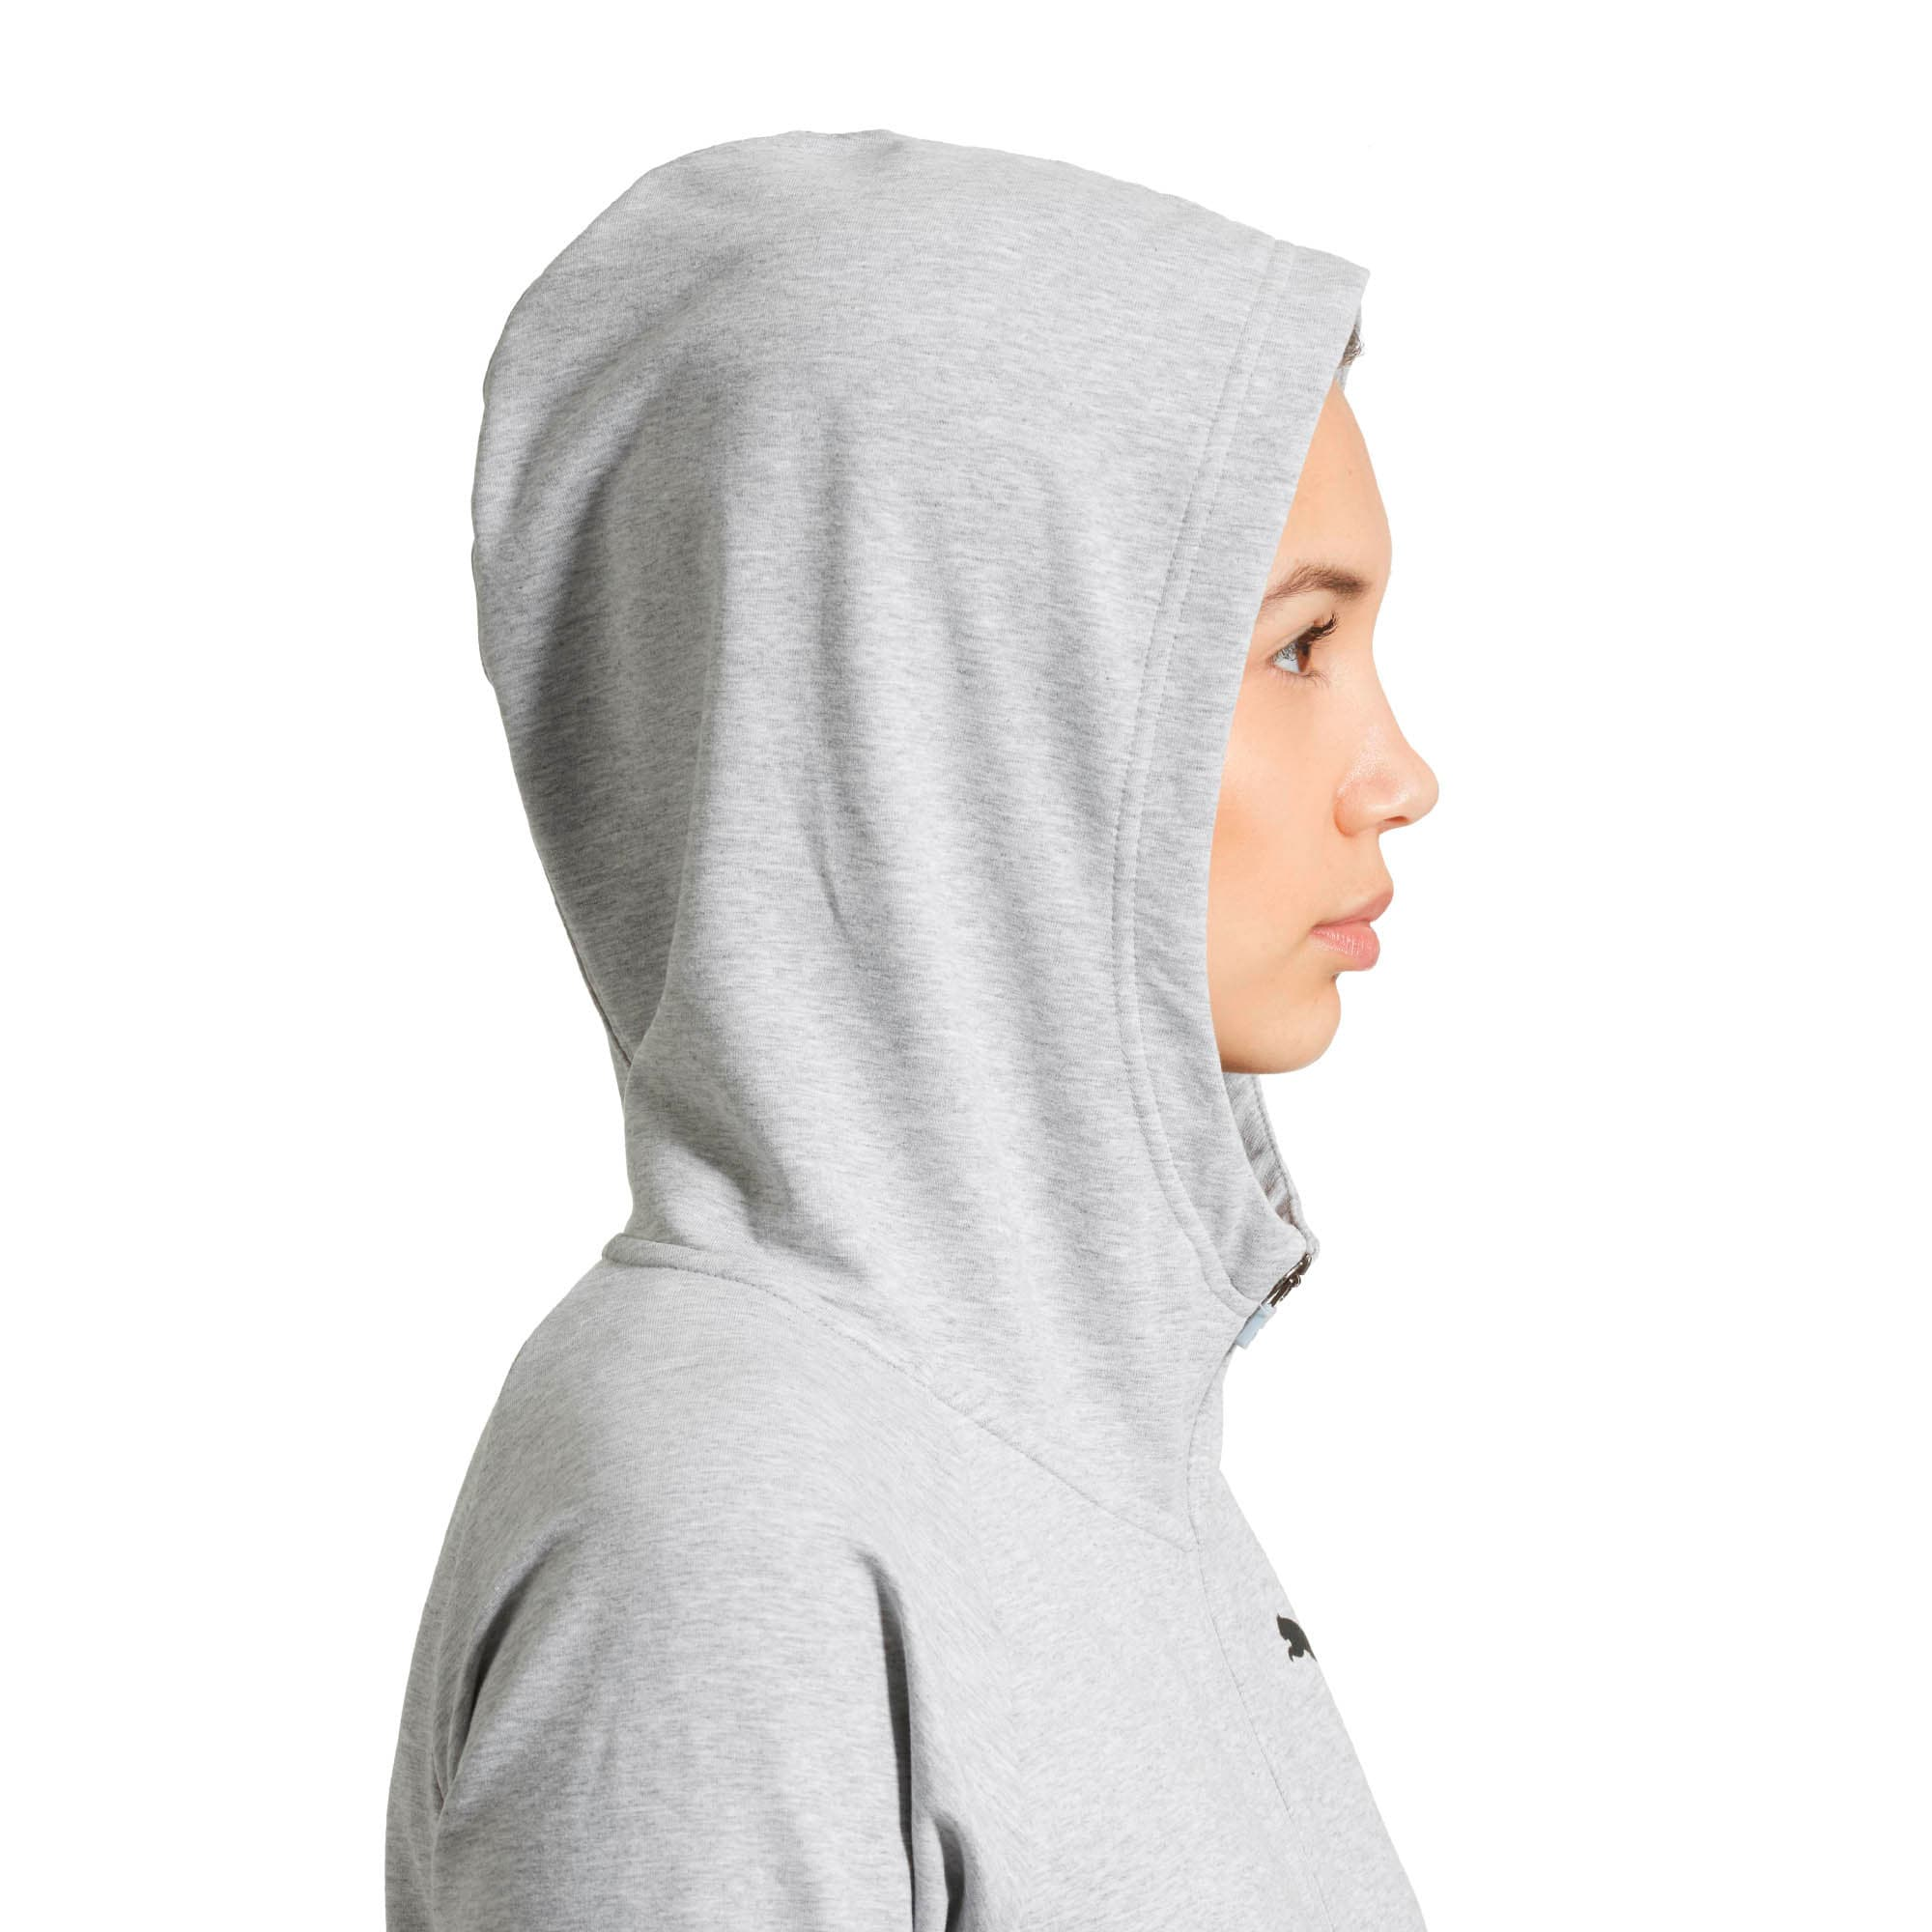 Thumbnail 3 of Training Urban Sports  Women's Full Zip Hoodie, Light Gray Heather, medium